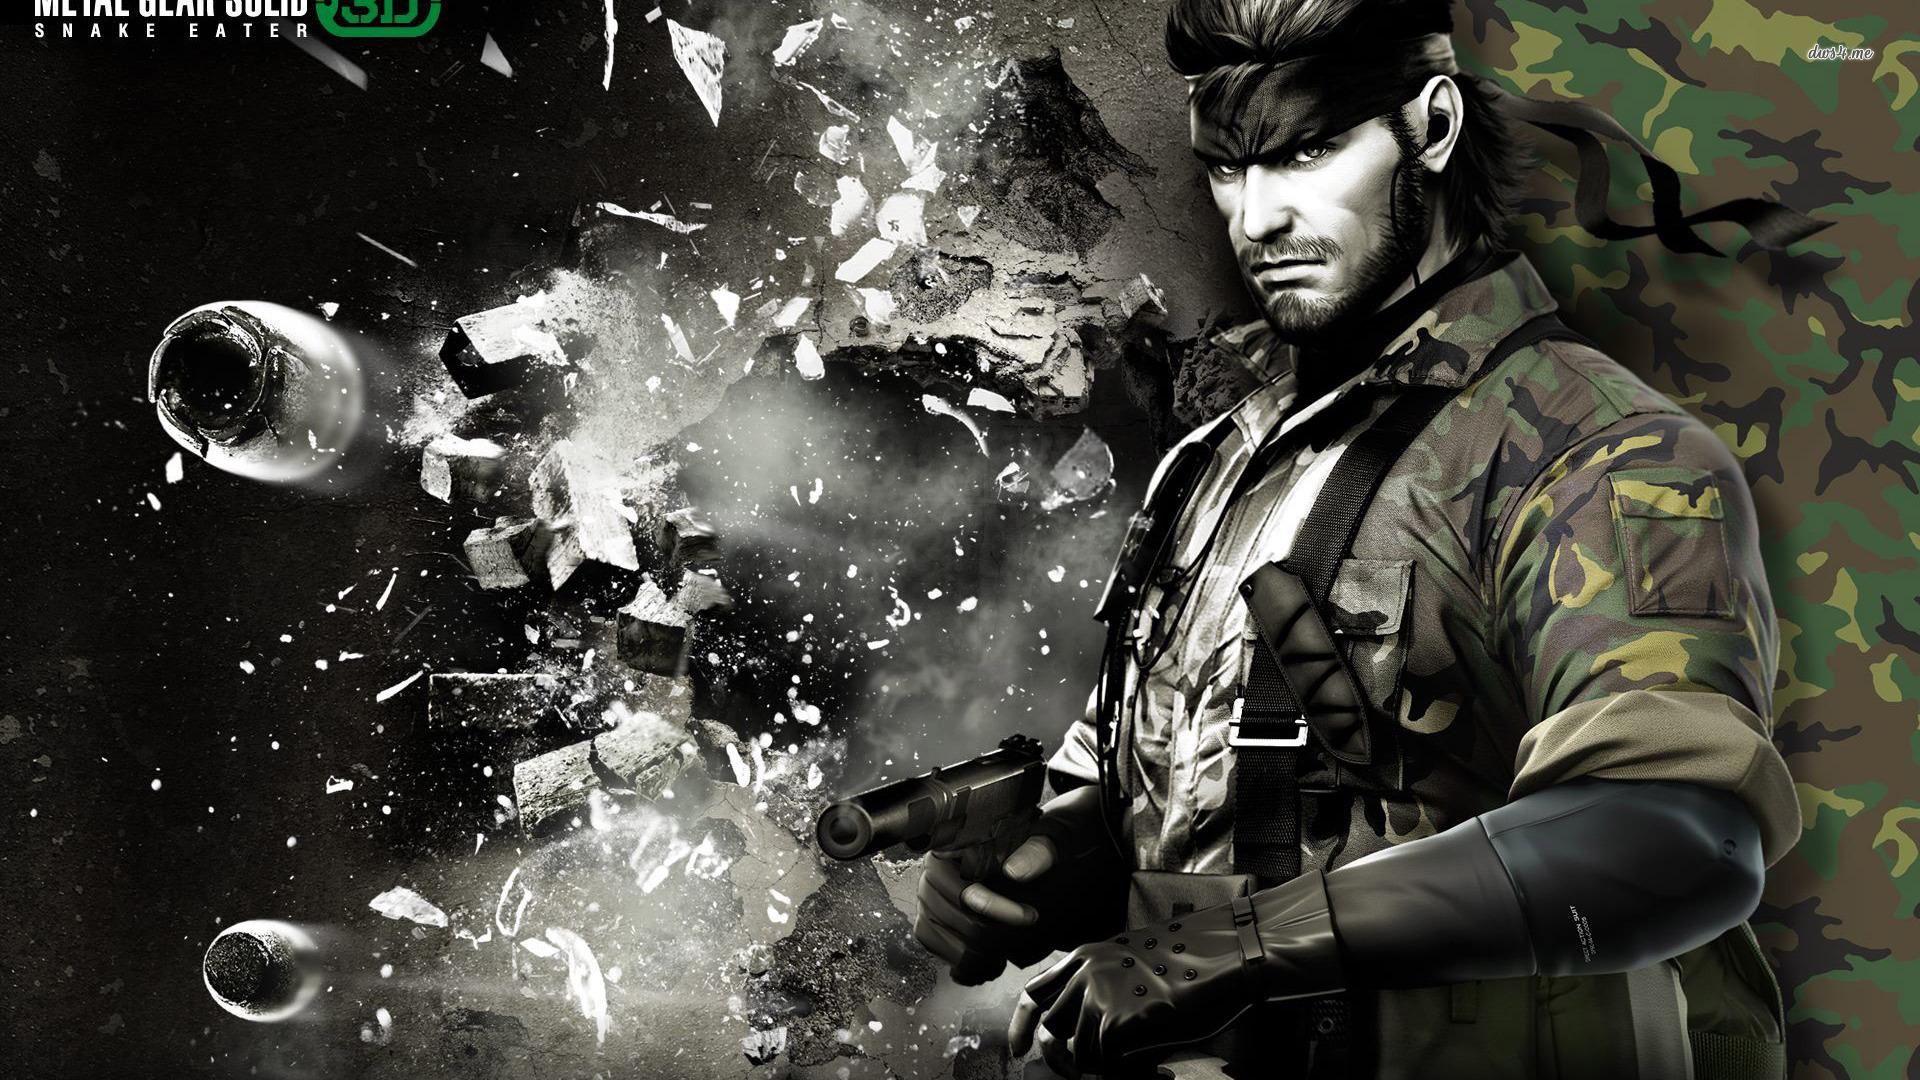 Free Download Metal Gear Solid Image Hd Wallpaper 1546 Wallpaper